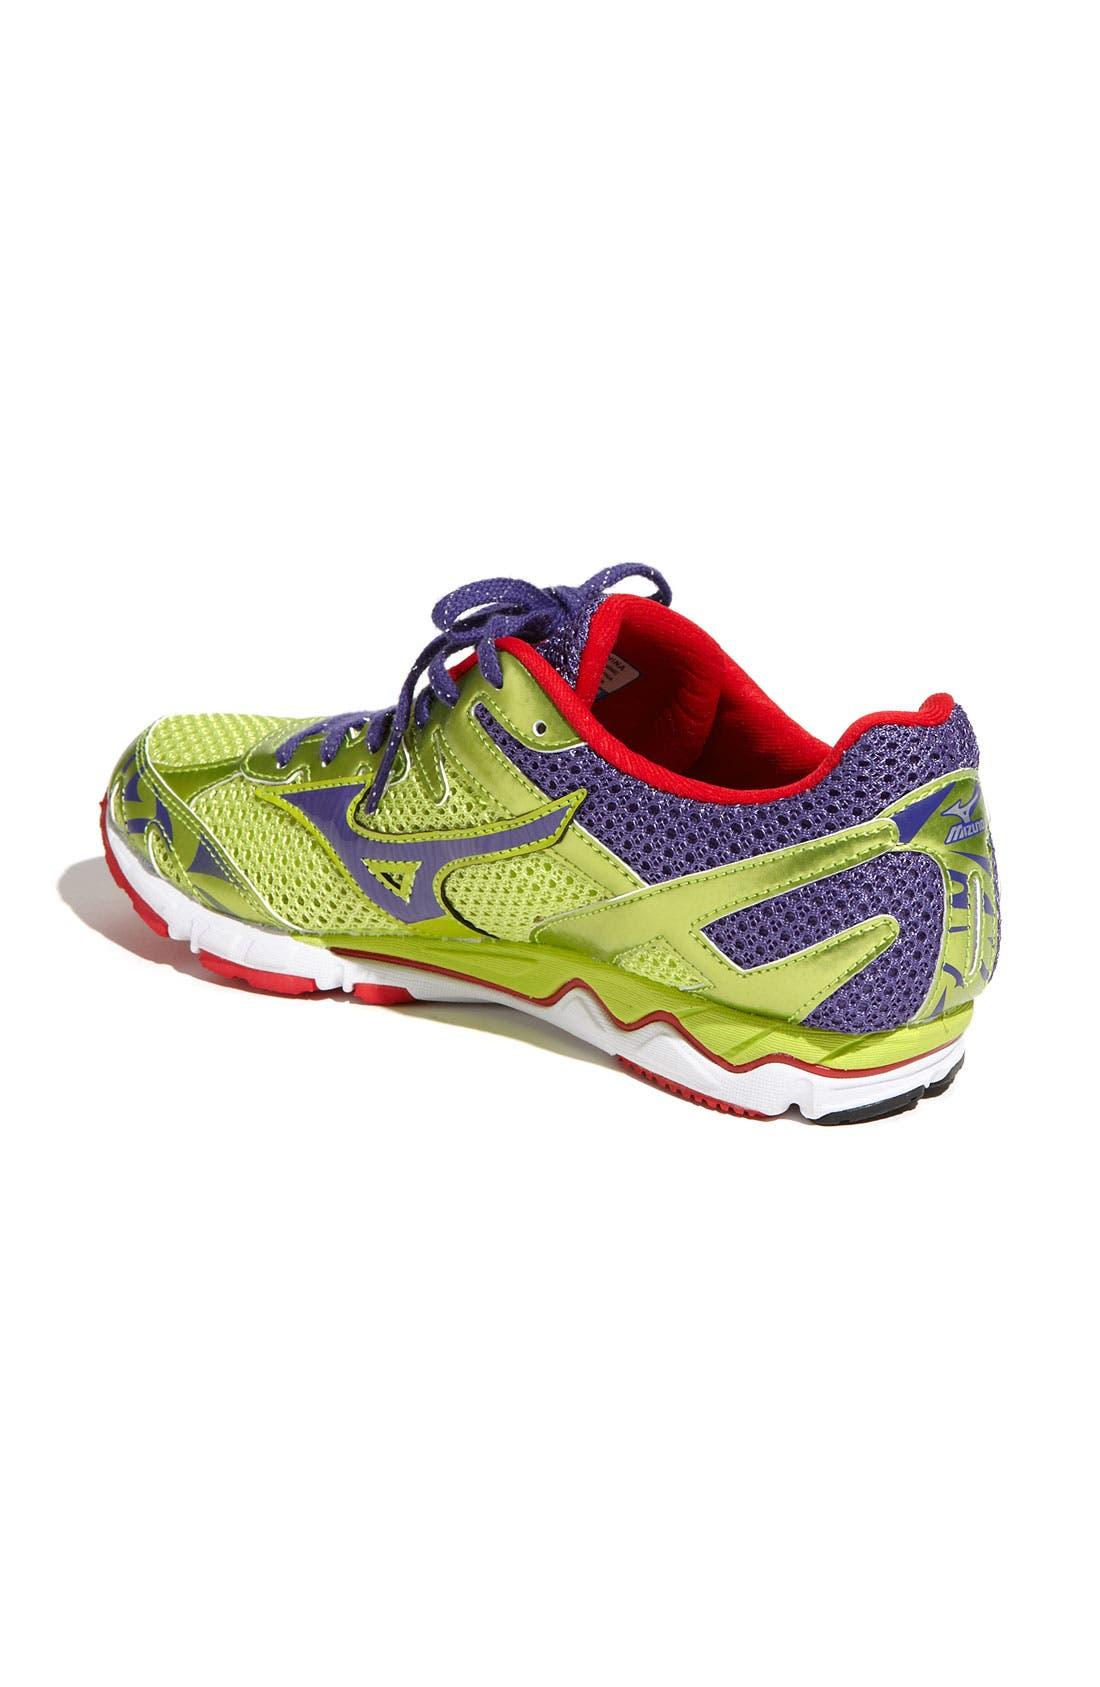 Alternate Image 2  - Mizuno 'Wave Musha 4' Running Shoe (Women) (Regular Retail Price: $89.95)